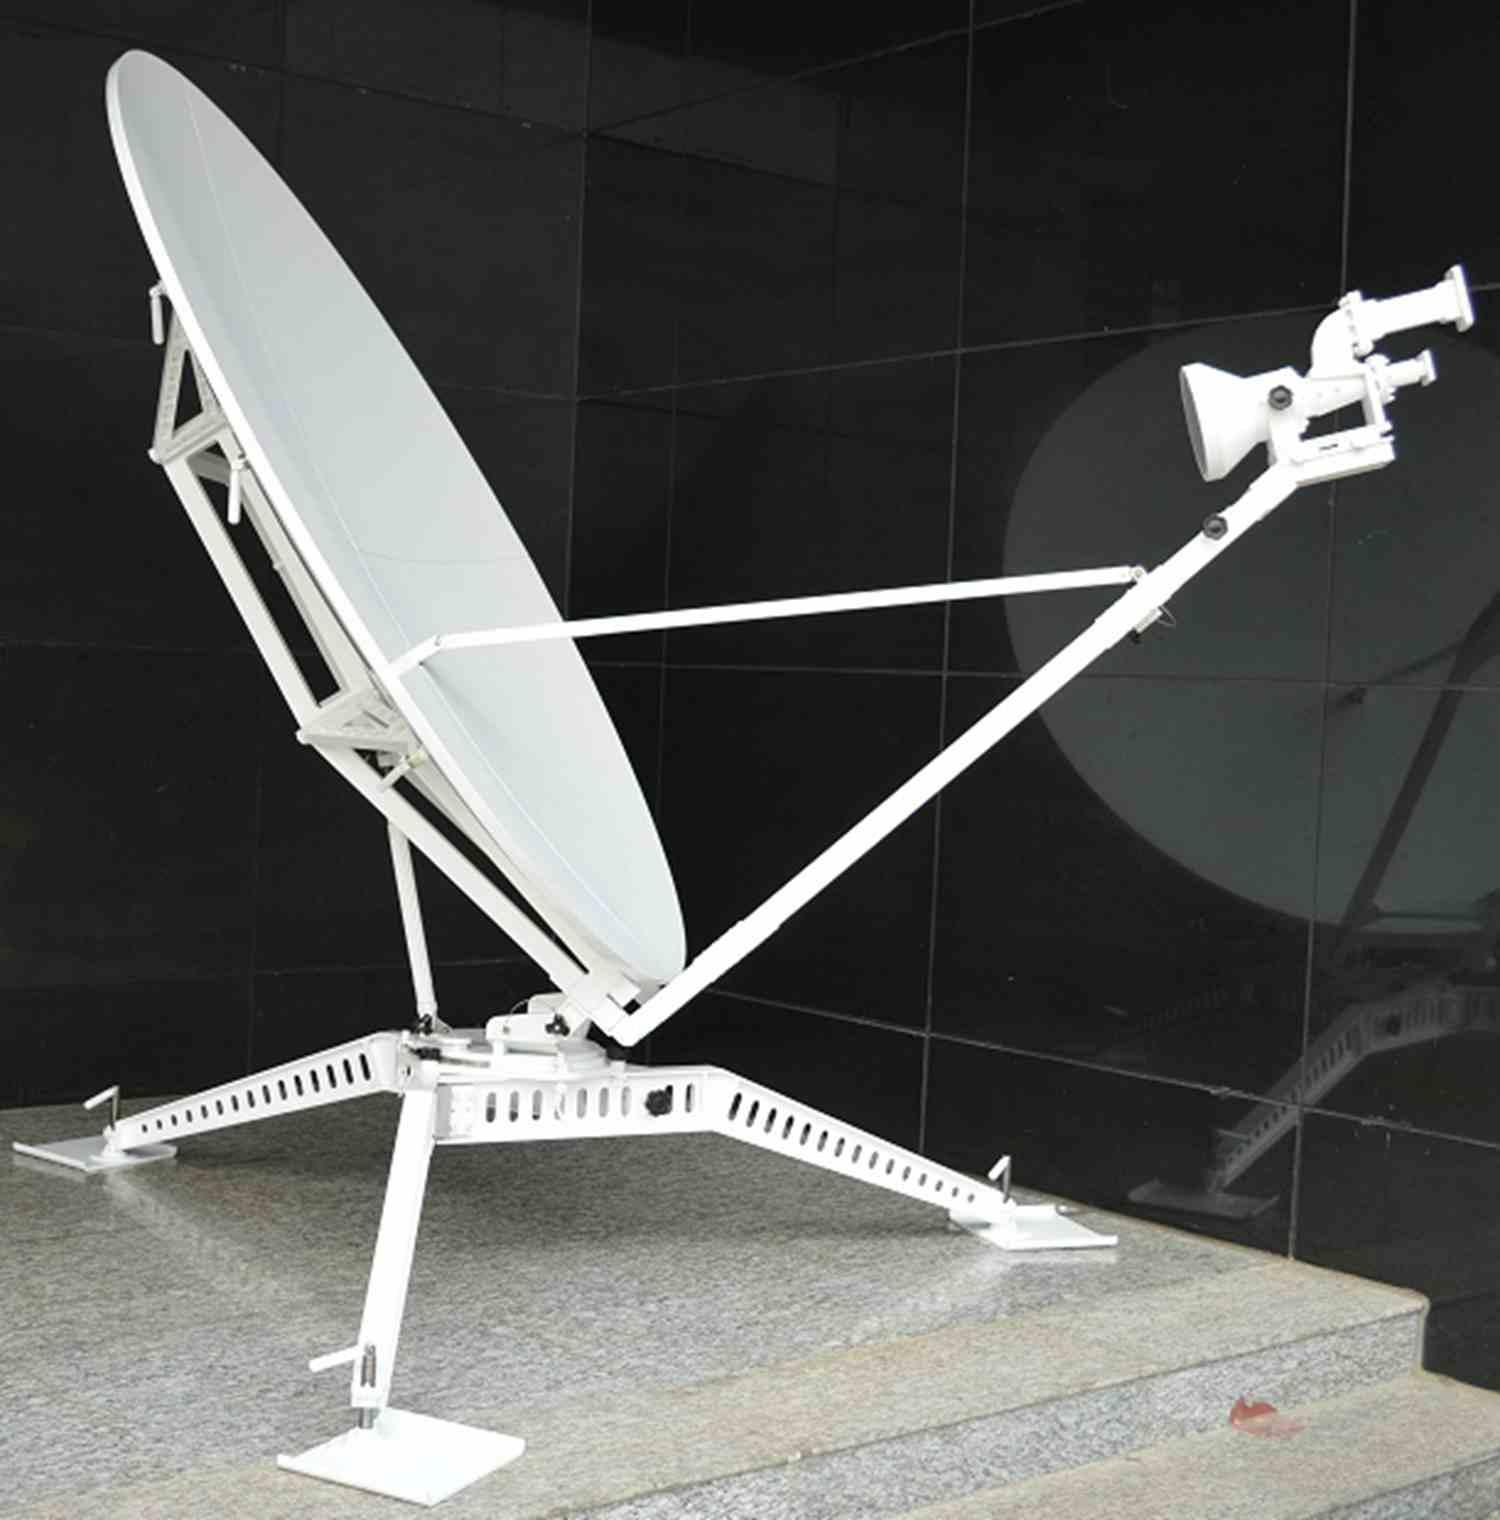 1.8m Carbon Fiber Flyaway Antenna